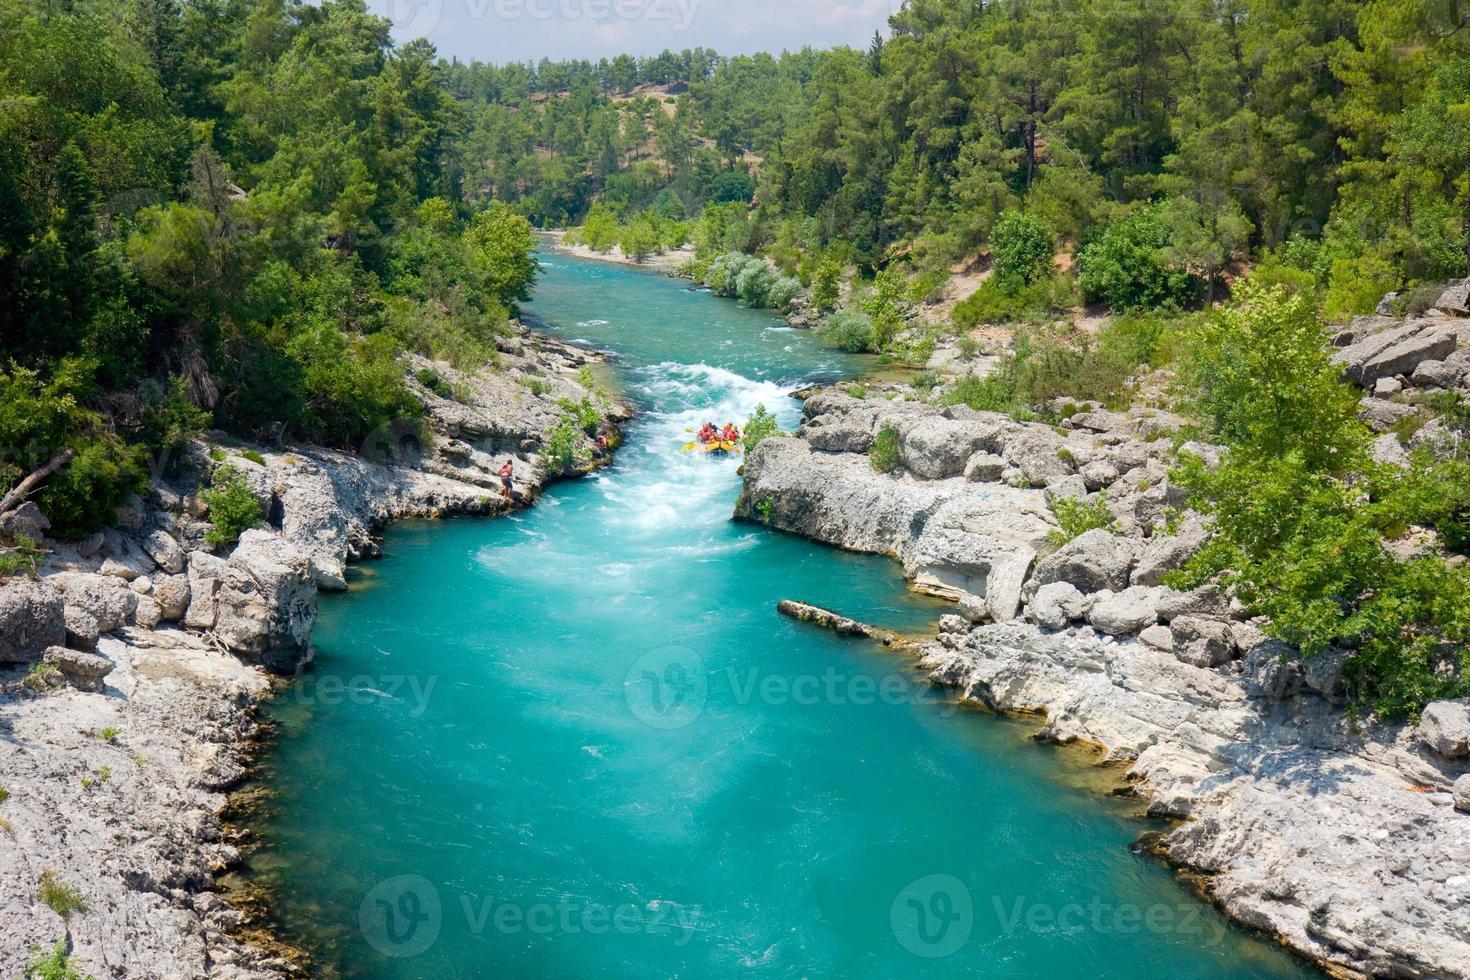 rafting in the green canyon, Alanya, Turkey photo